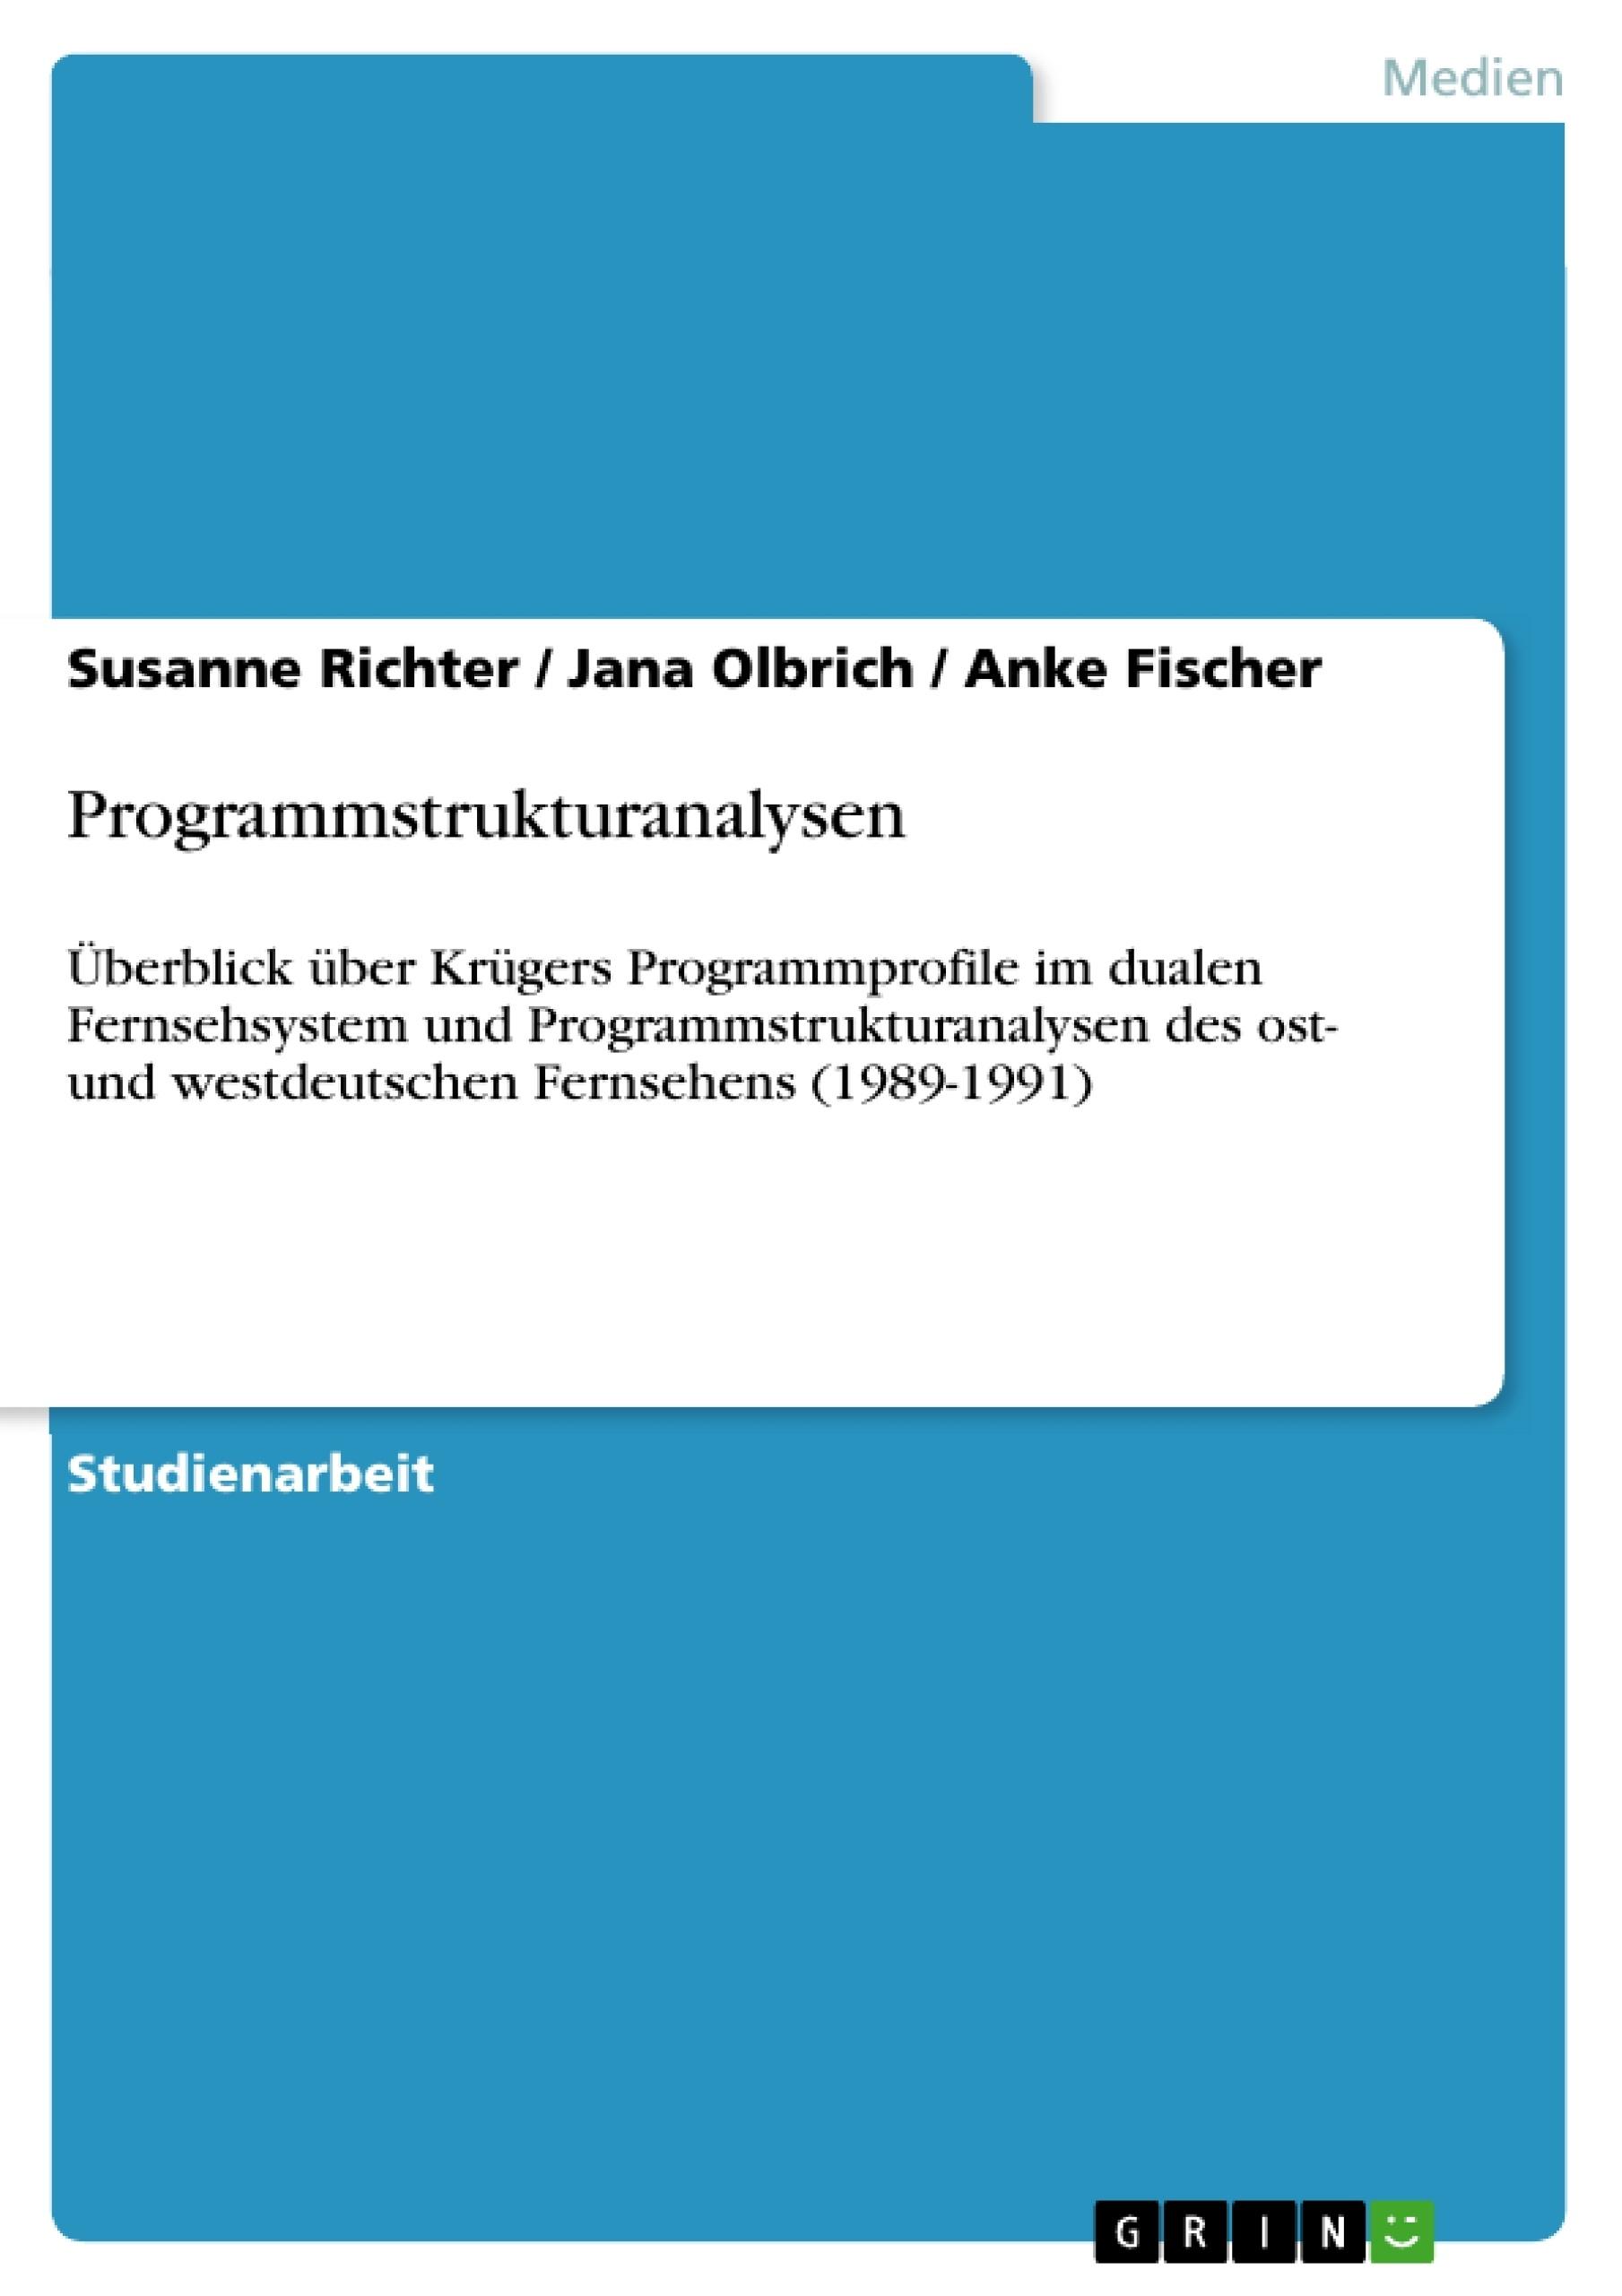 Titel: Programmstrukturanalysen